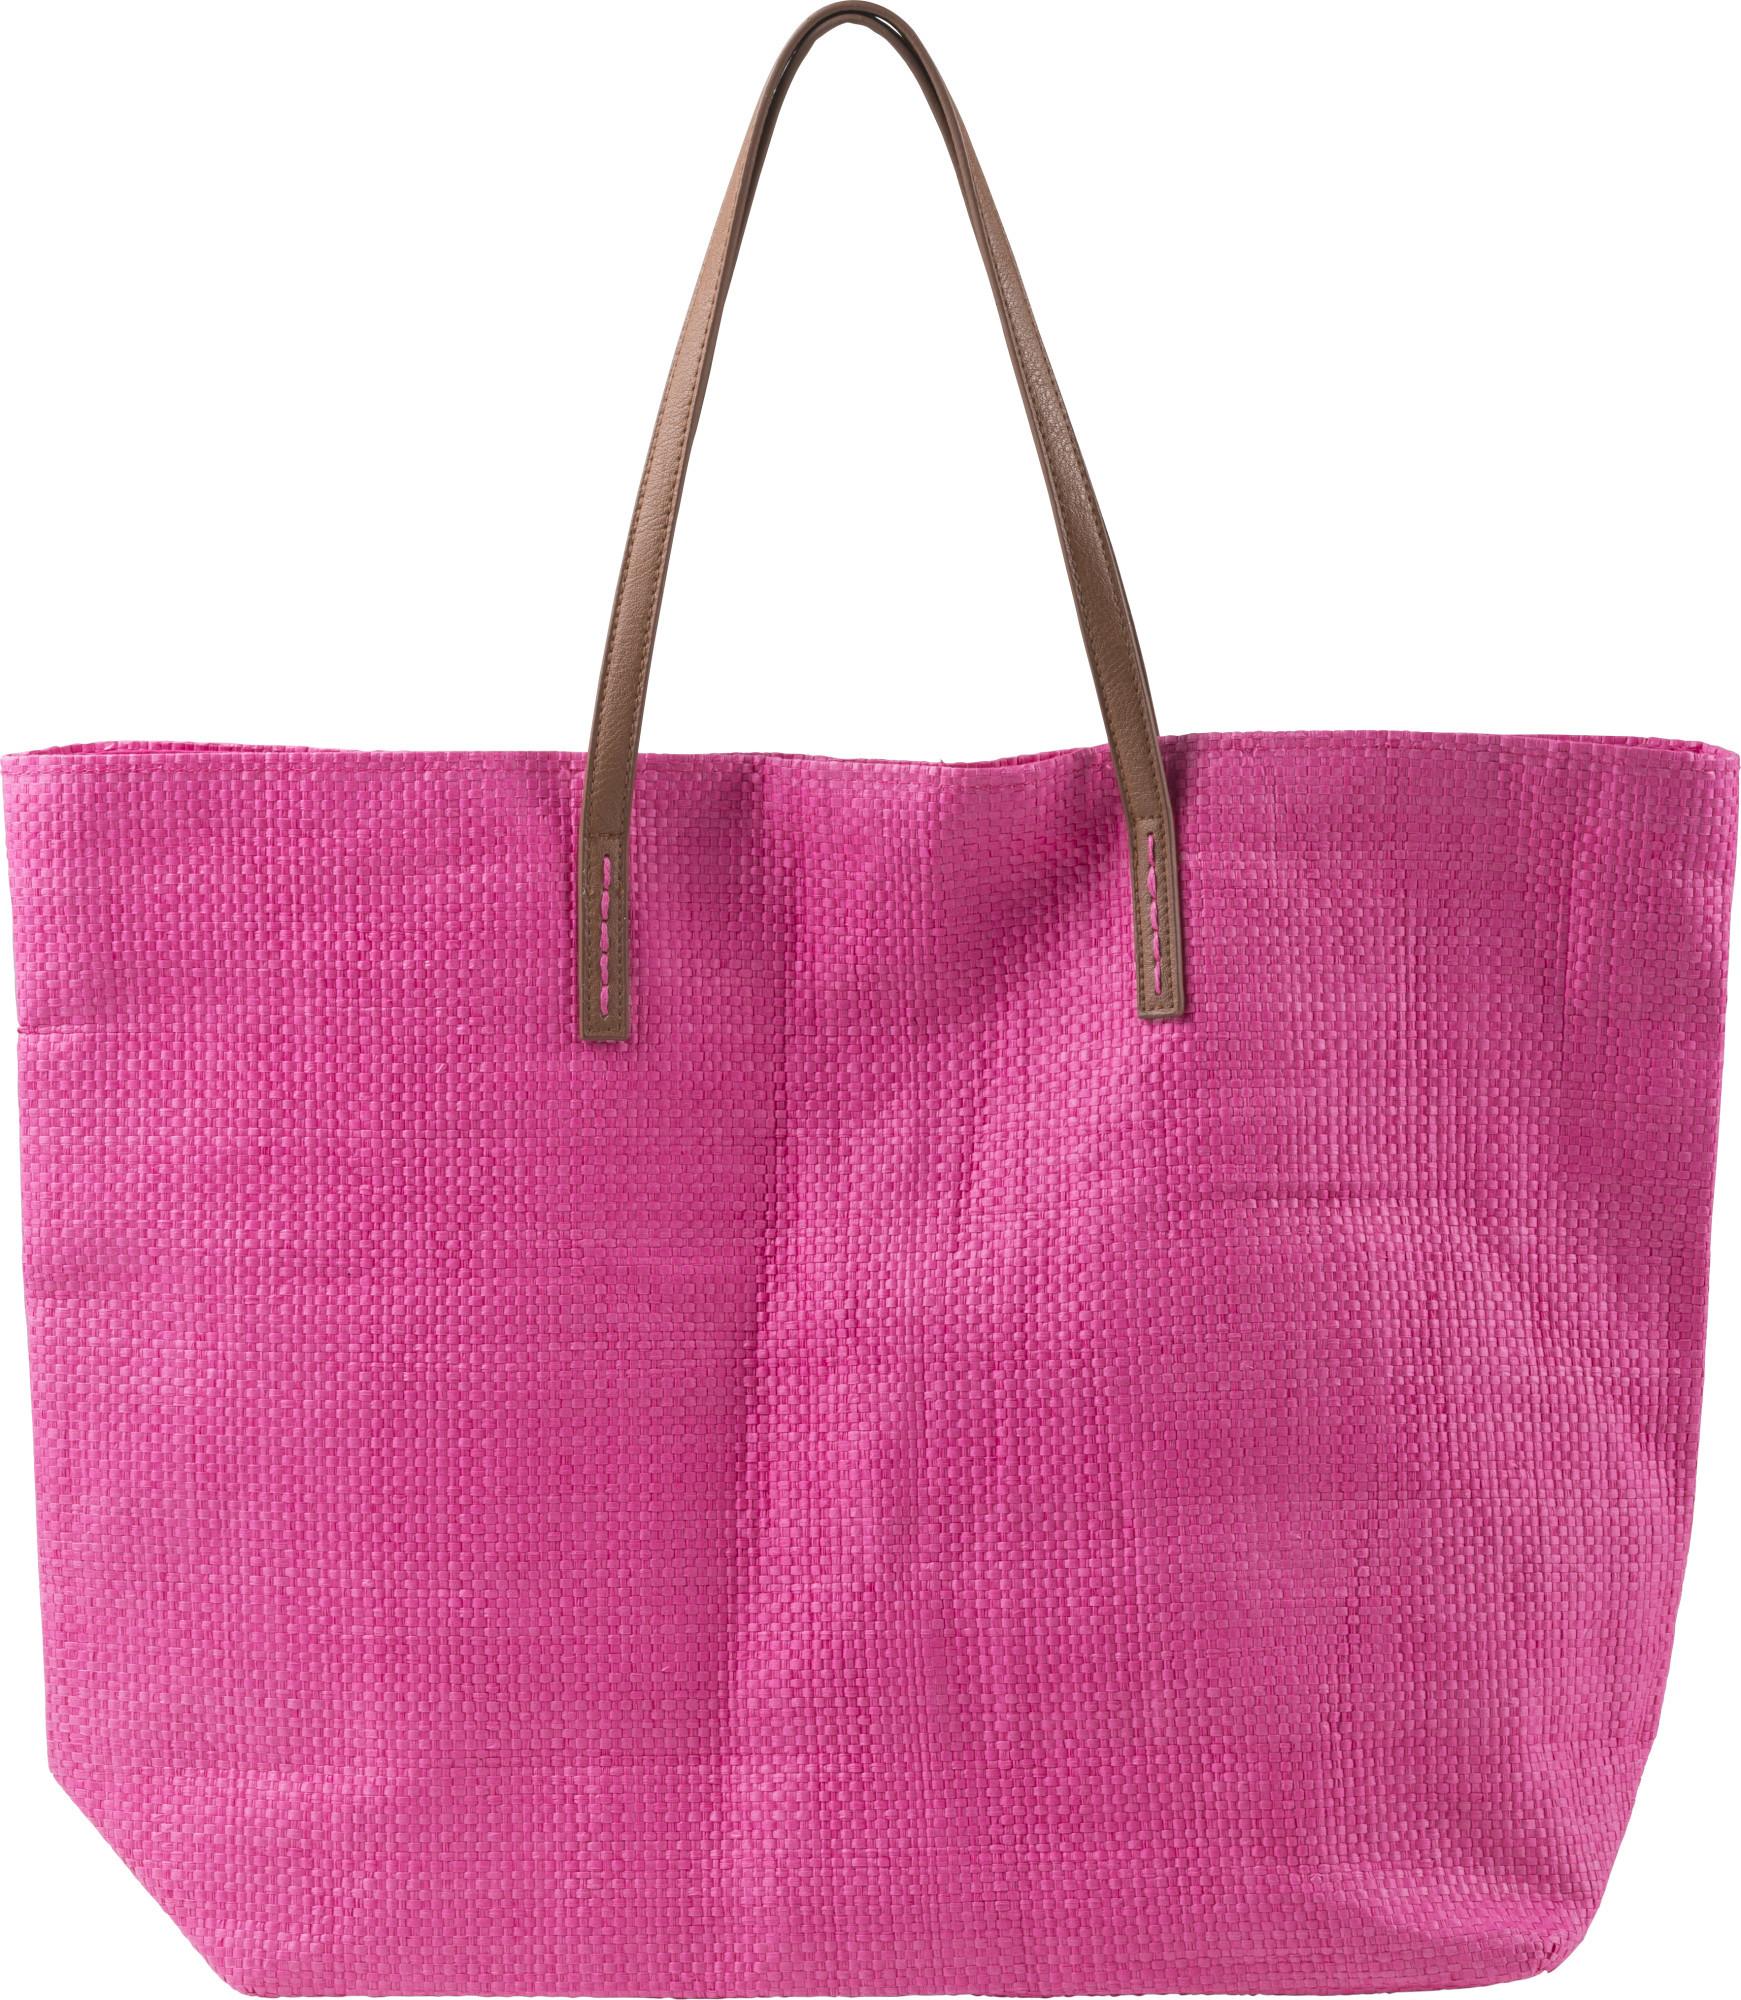 Sac shopping et plage en polyester - 19-1249-19